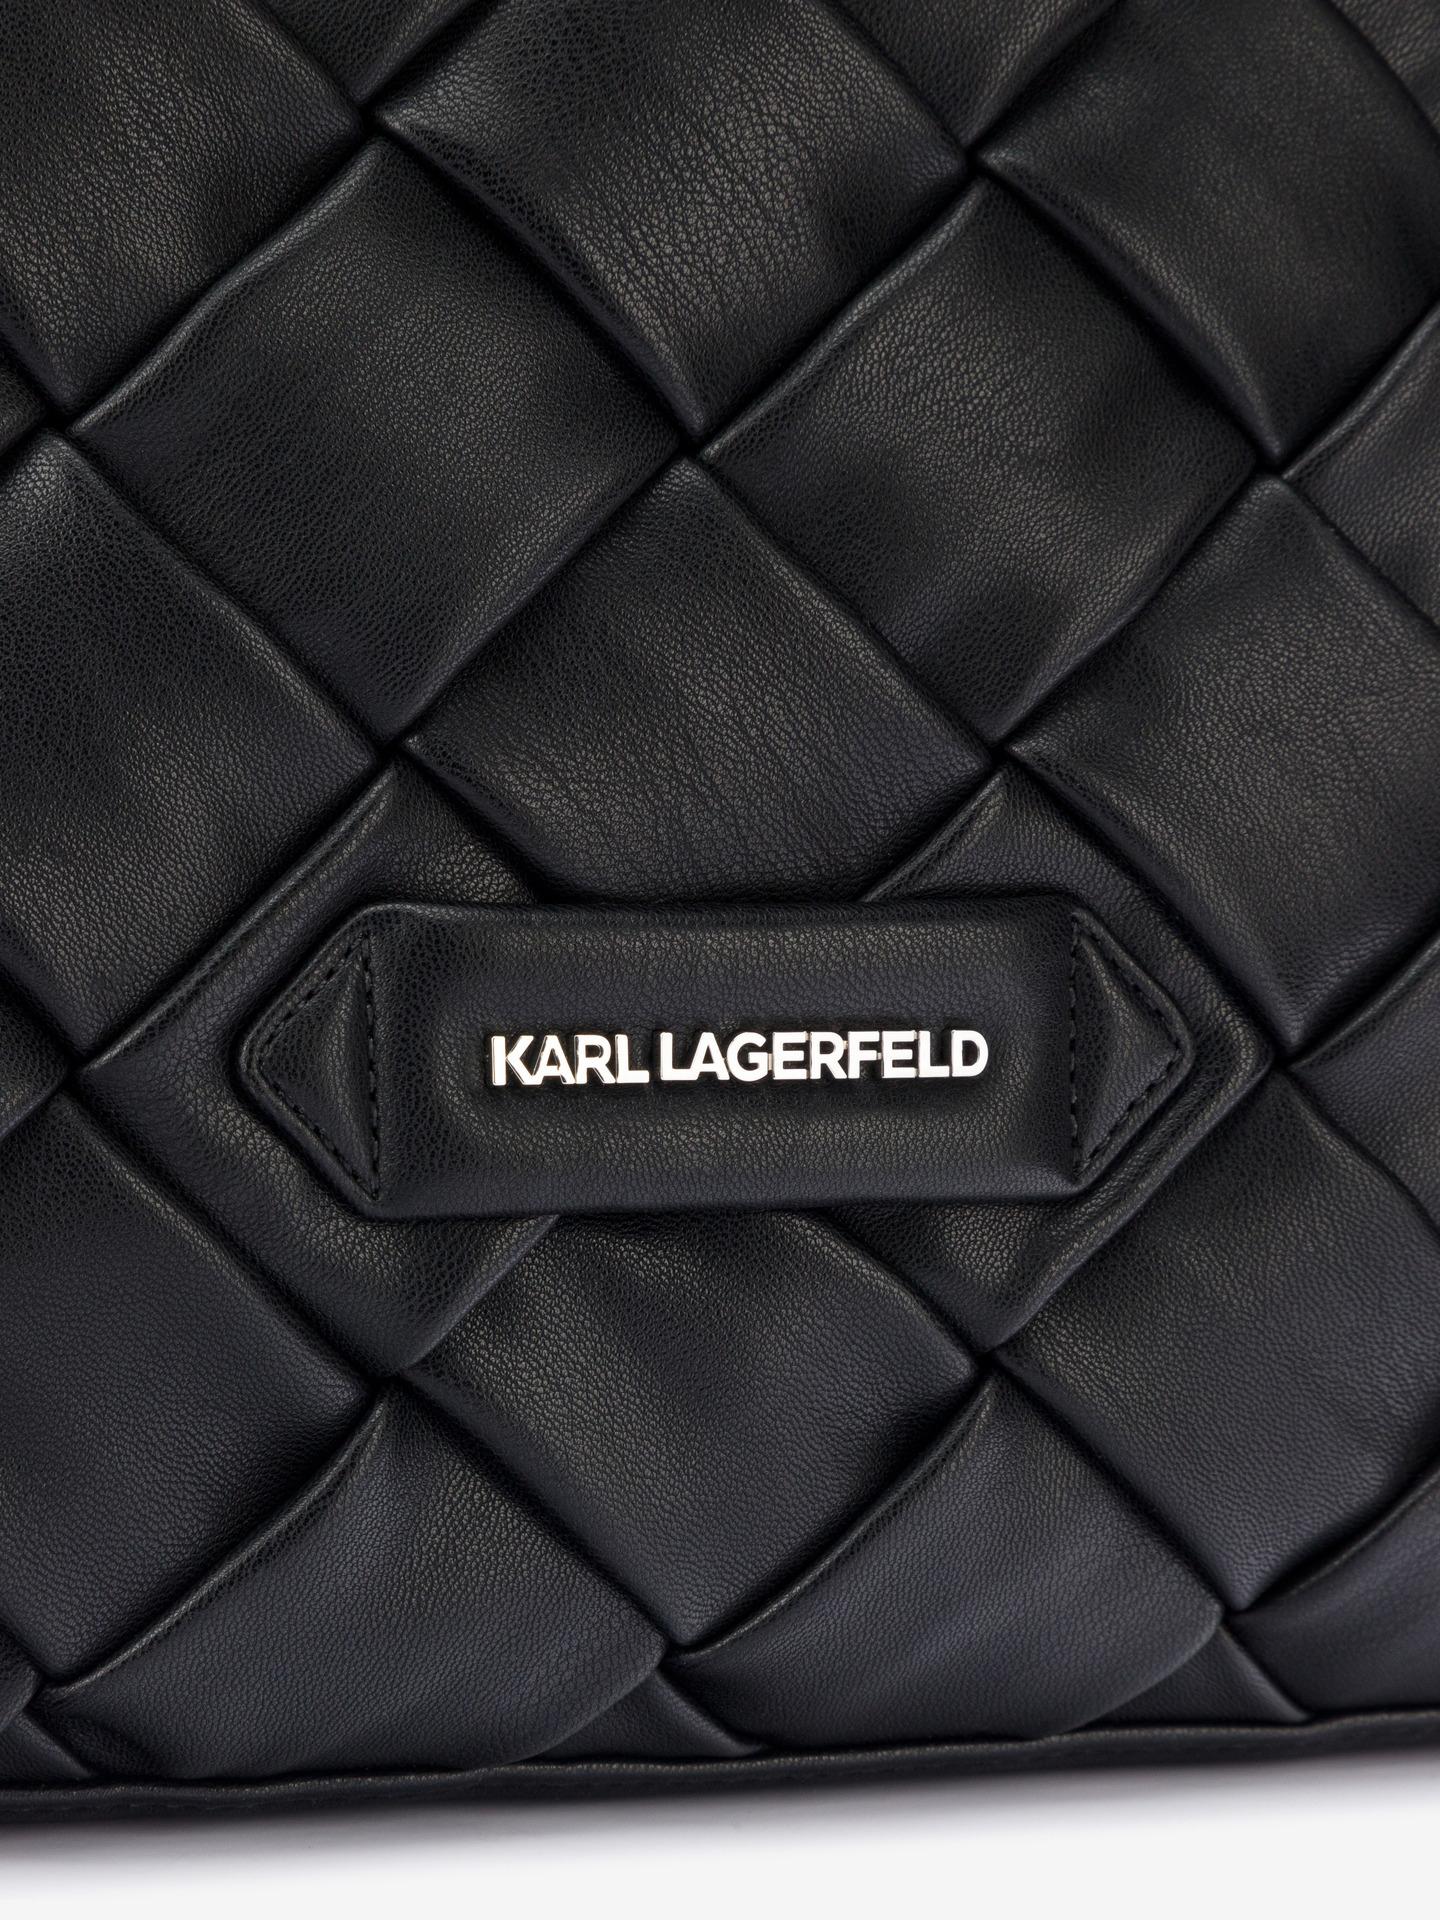 KARL LAGERFELD Borsetta donna nero  Braid